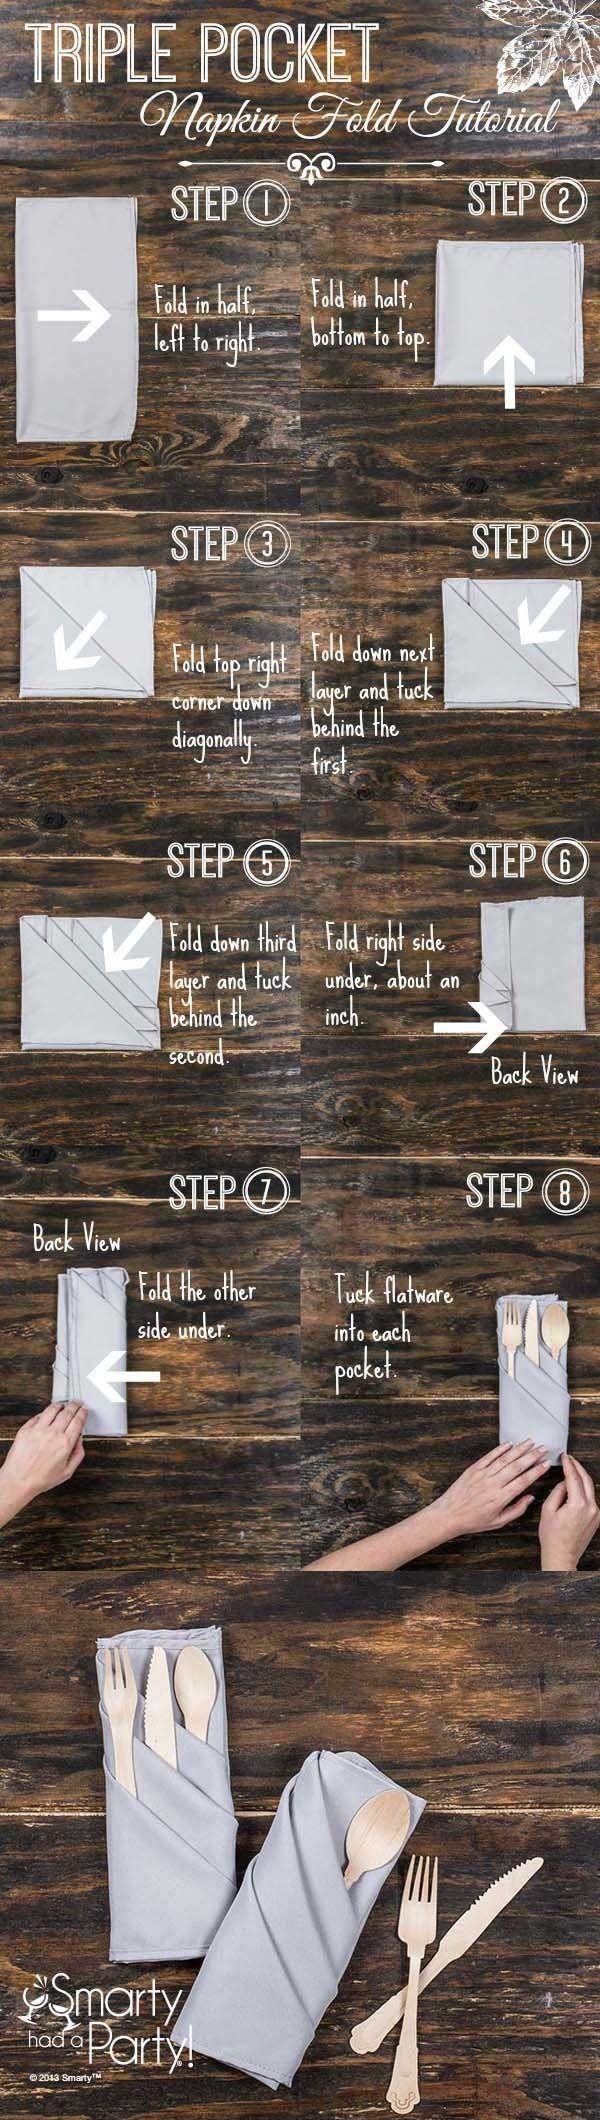 DIY Napkin Folding thanksgiving dinnerware party ideas table ideas dinner tables party tables dinner napkins